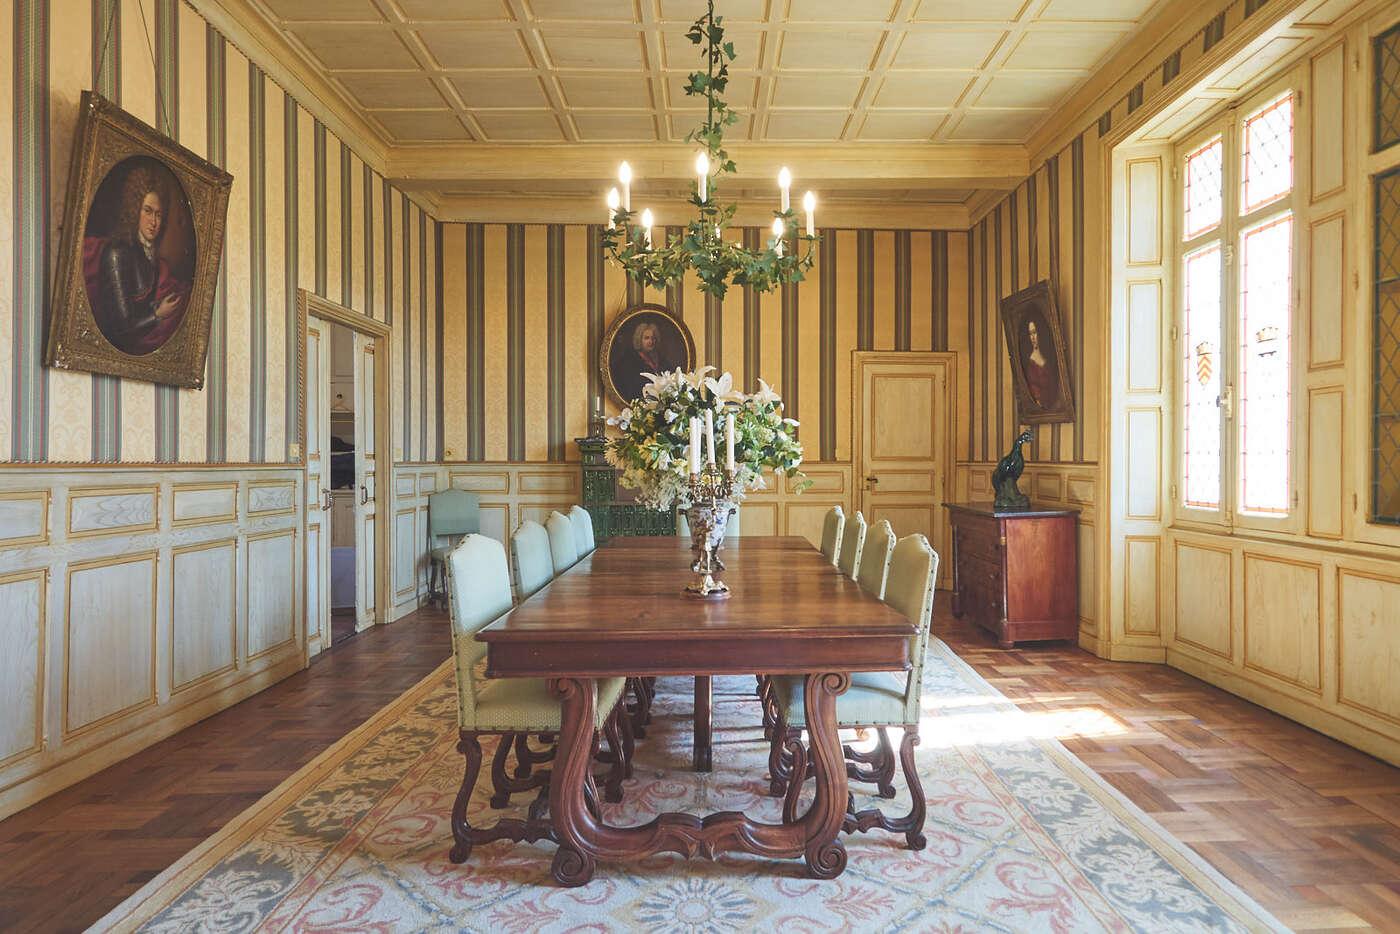 Salle à manger du château de Marqueyssac